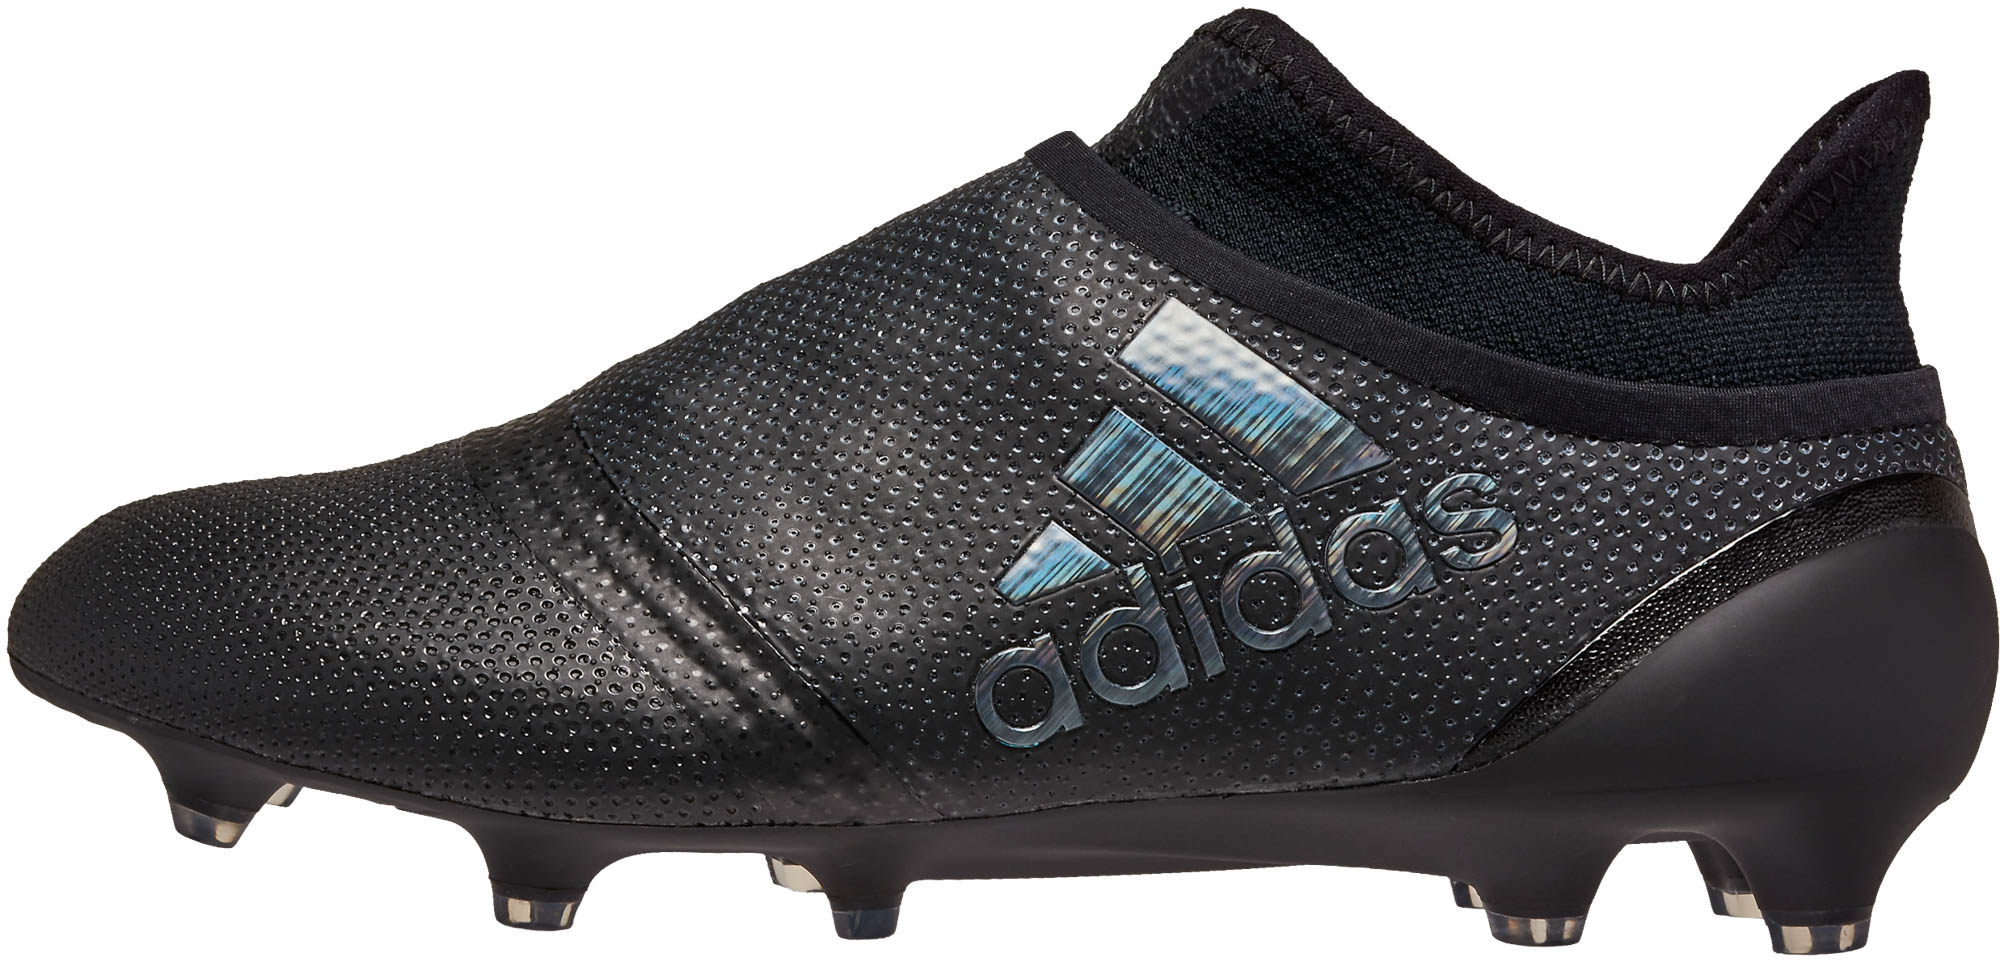 adidas X 17 PureSpeed FG Black - SoccerPro com